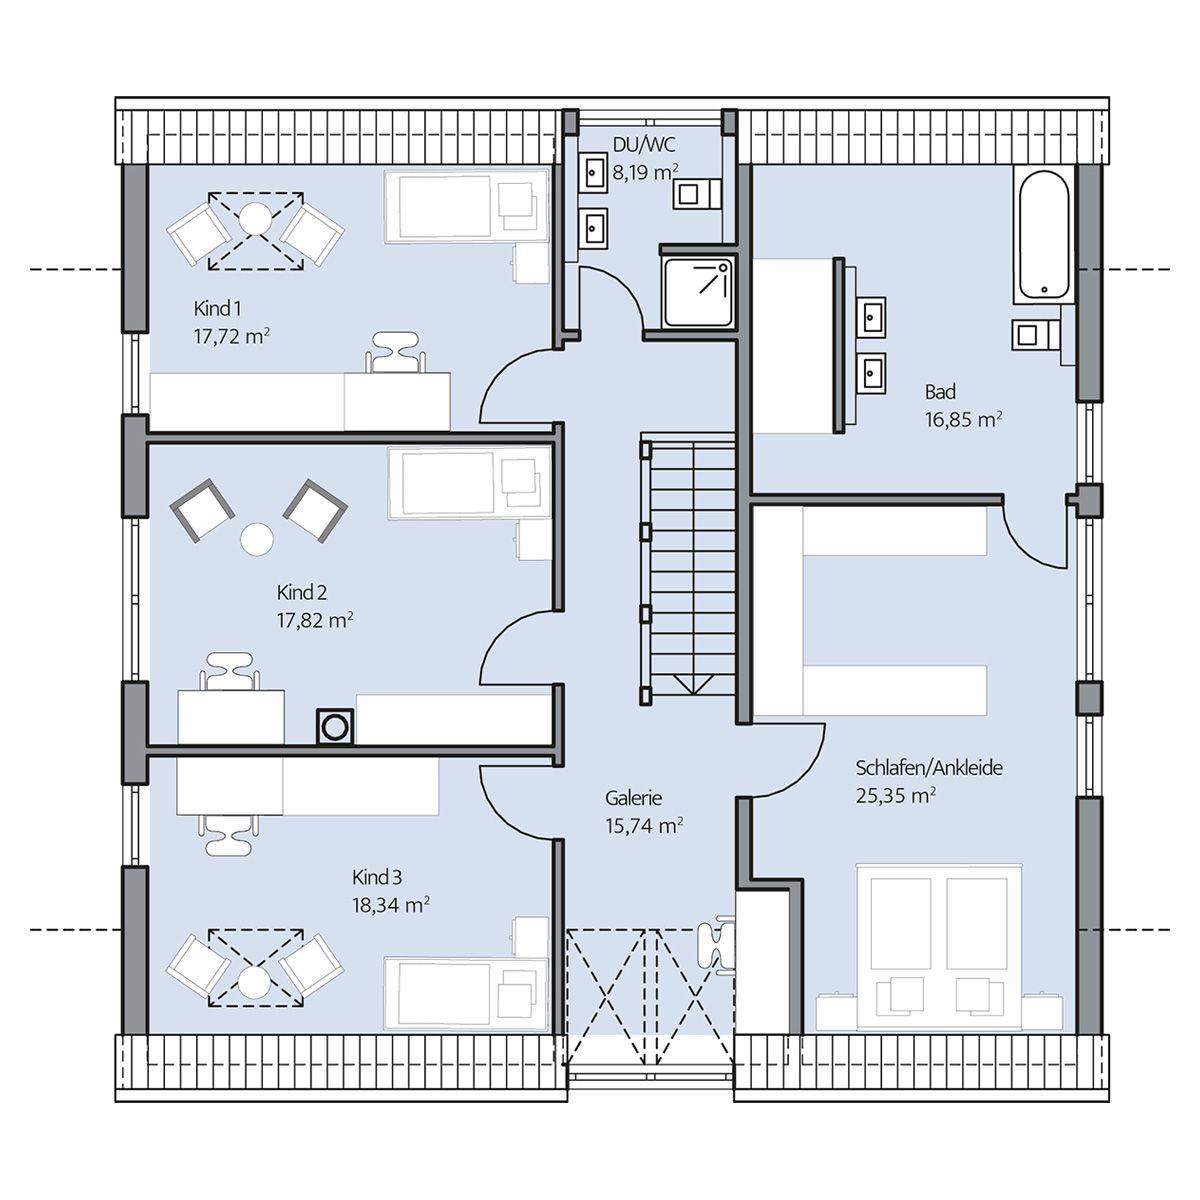 uploads tx bmhhousegallery haus goetze grundriss dg bemasst col16 hg. Black Bedroom Furniture Sets. Home Design Ideas